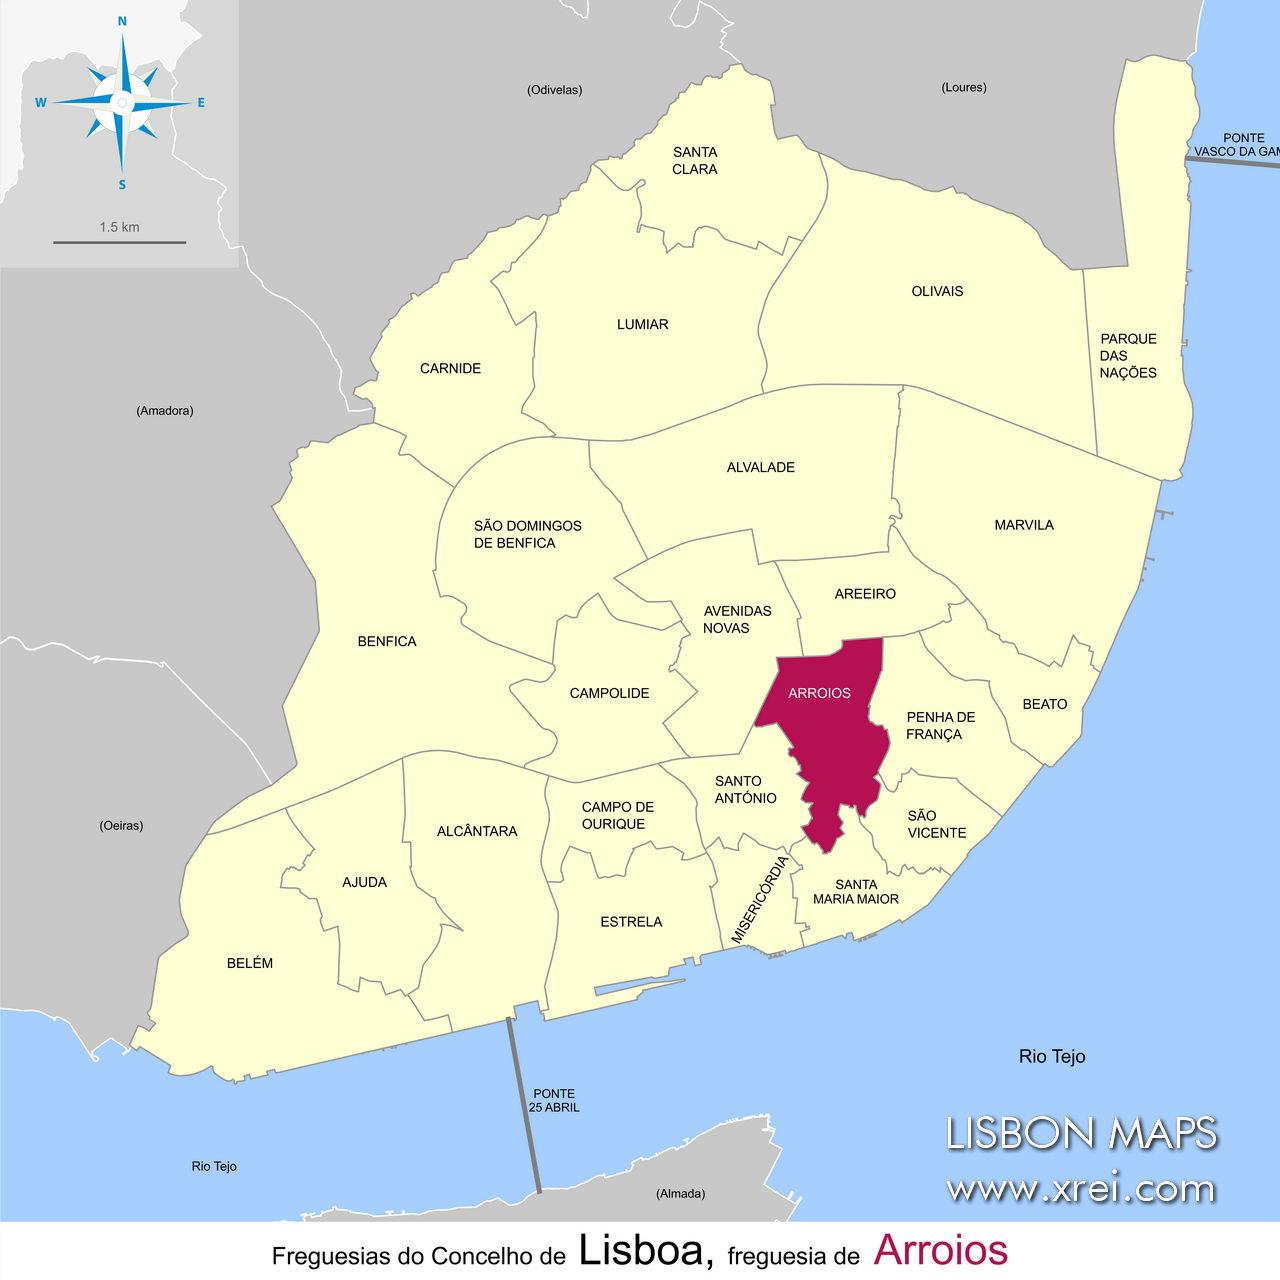 Arroios parish location on the map of Lisbon